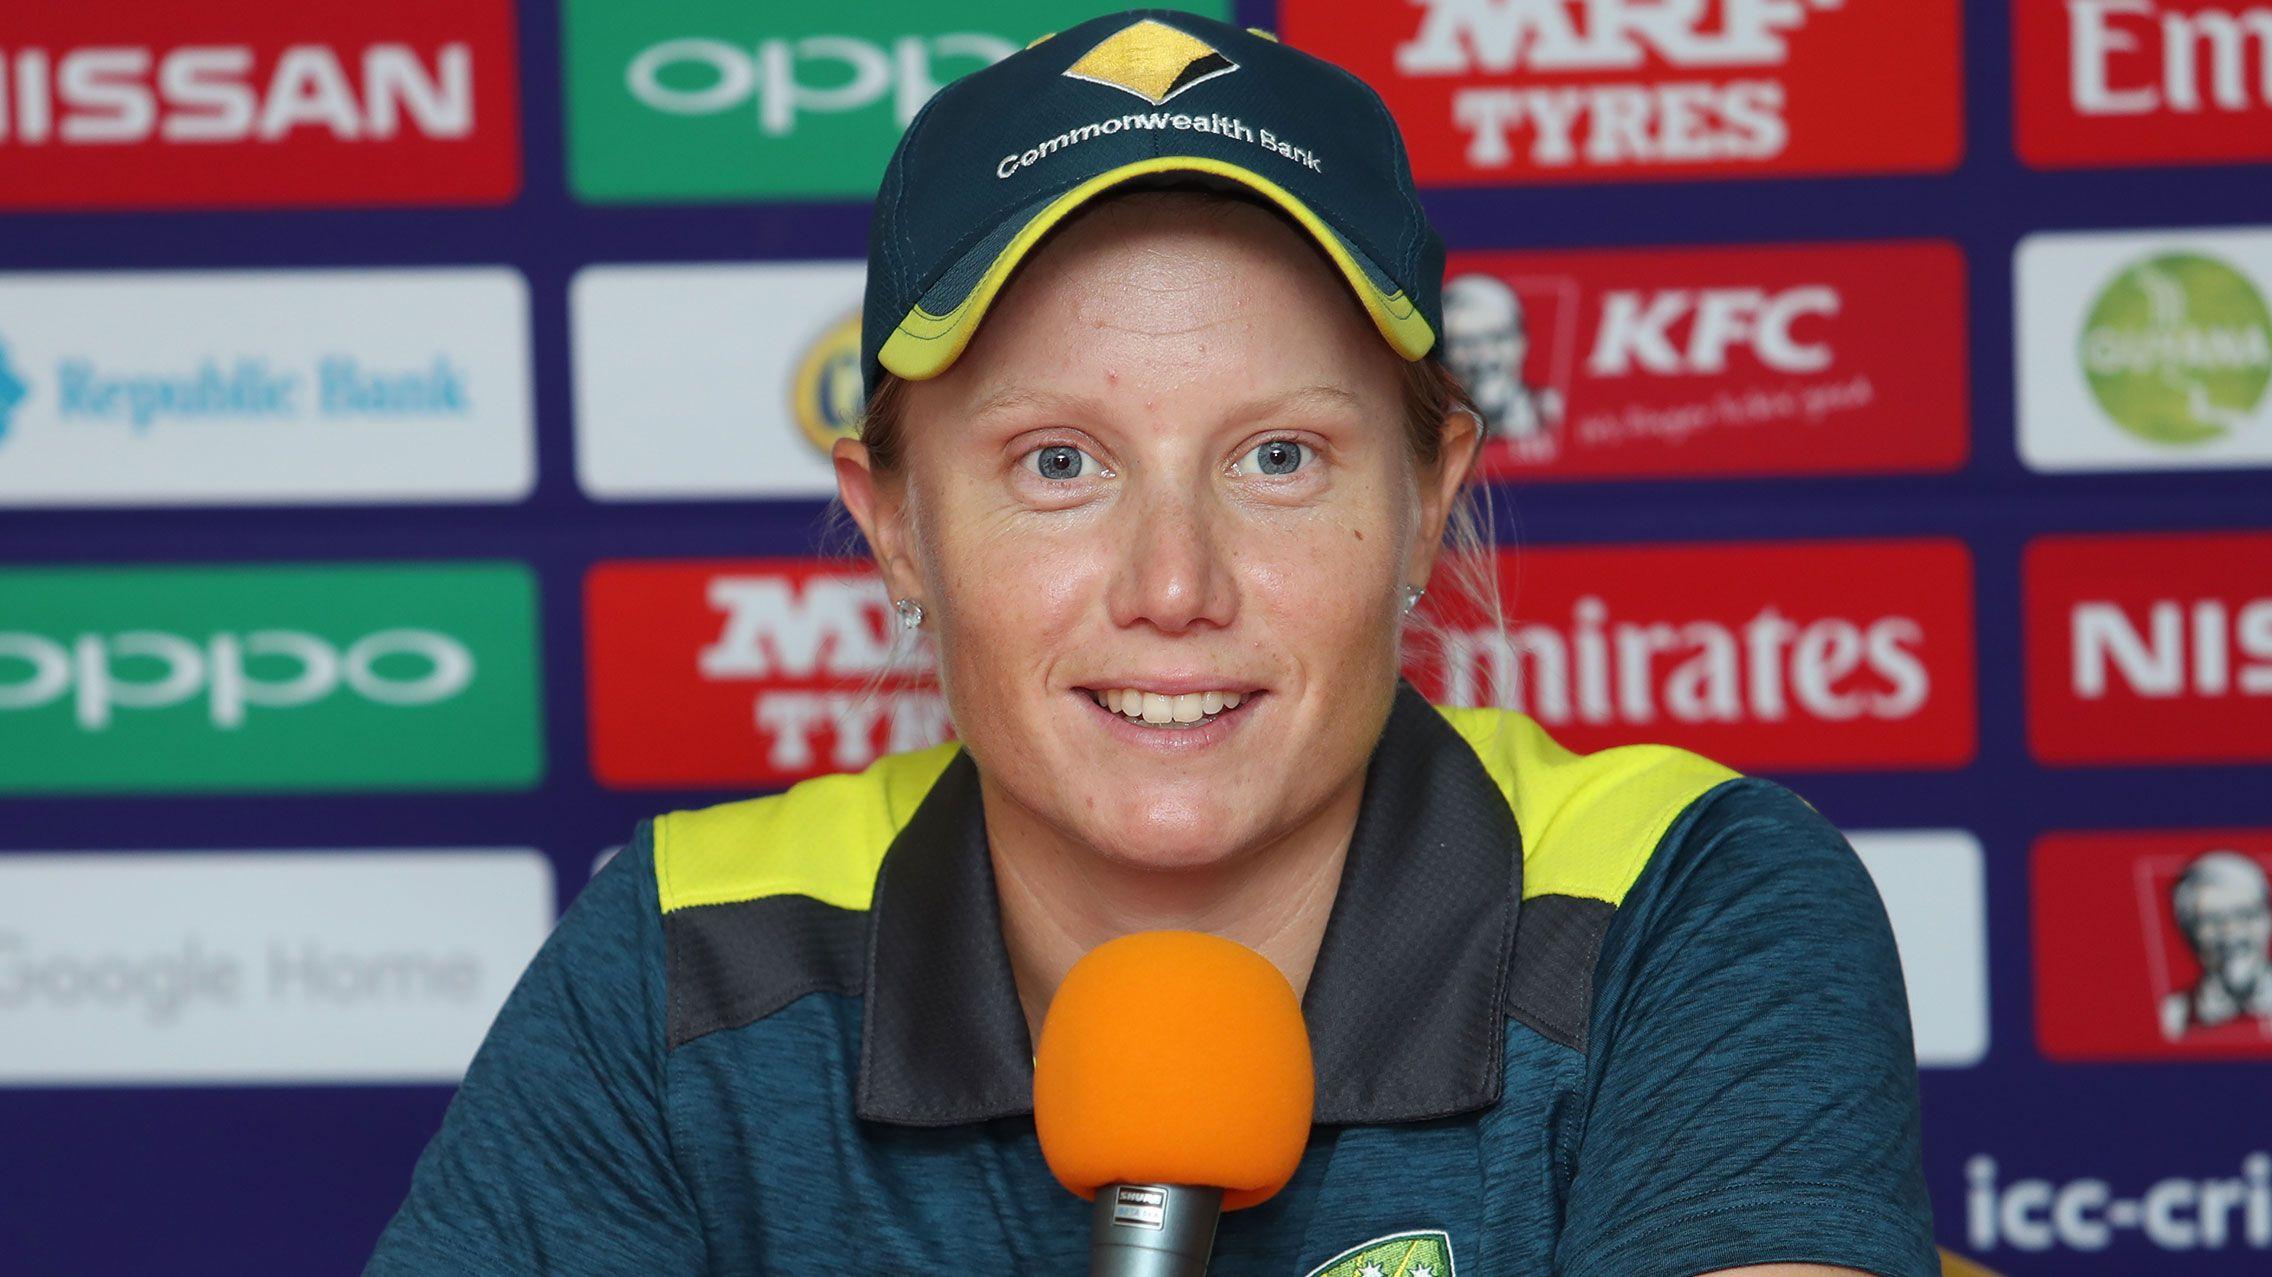 Alyssa Healy: Cricket News: Women's T20 World Cup, Alyssa Healy, Viv